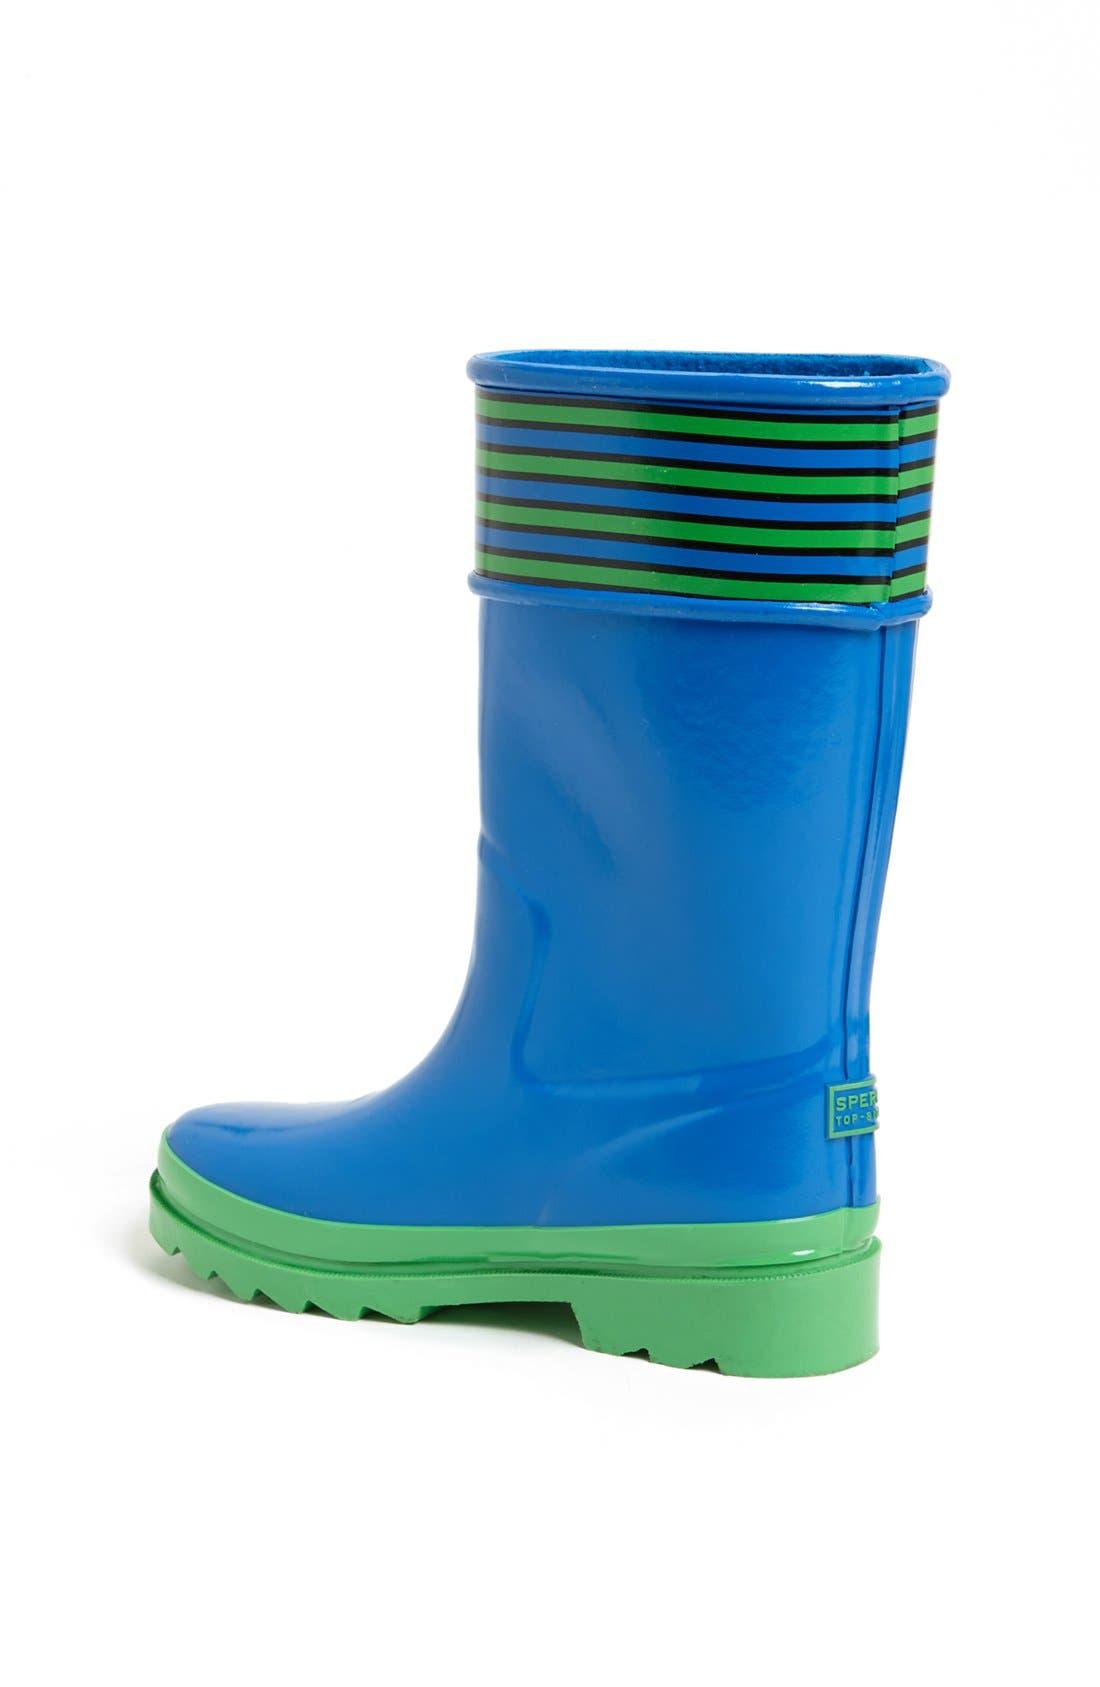 Alternate Image 2  - Sperry Kids 'Pelican' Rain Boot (Walker, Toddler, Little Kid & Big Kid)